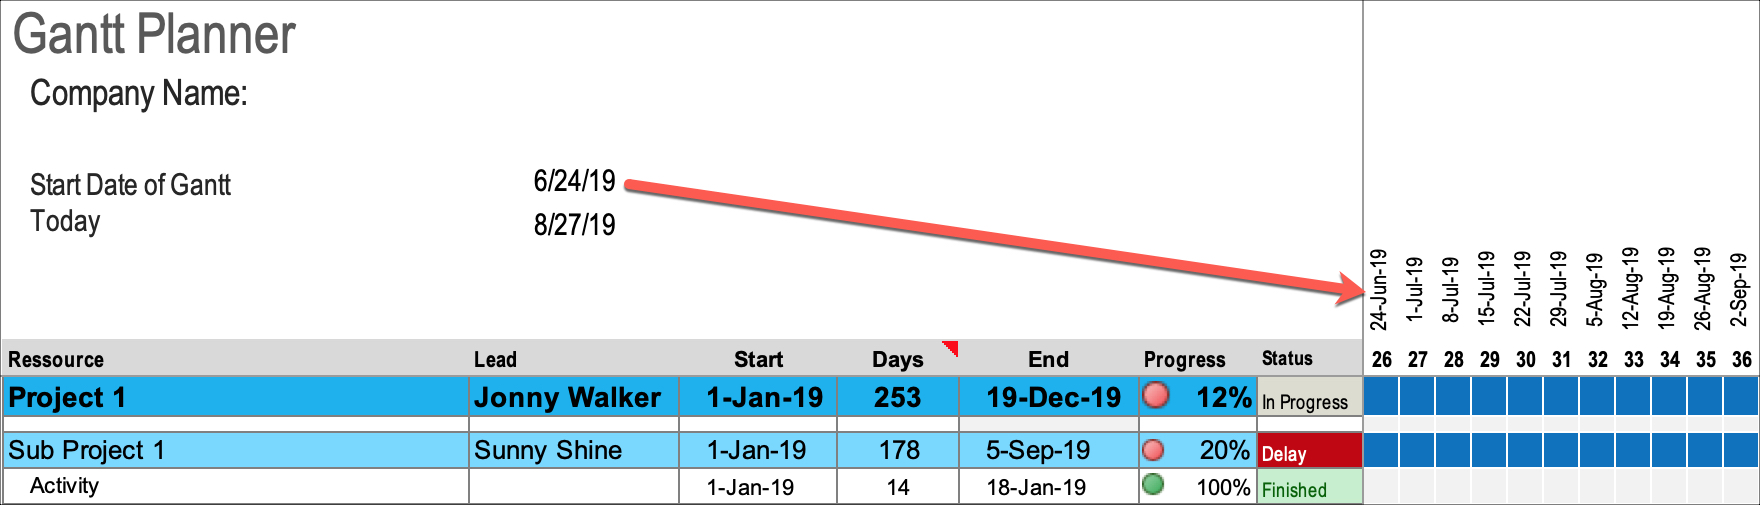 Gantt Chart Planner Start Date